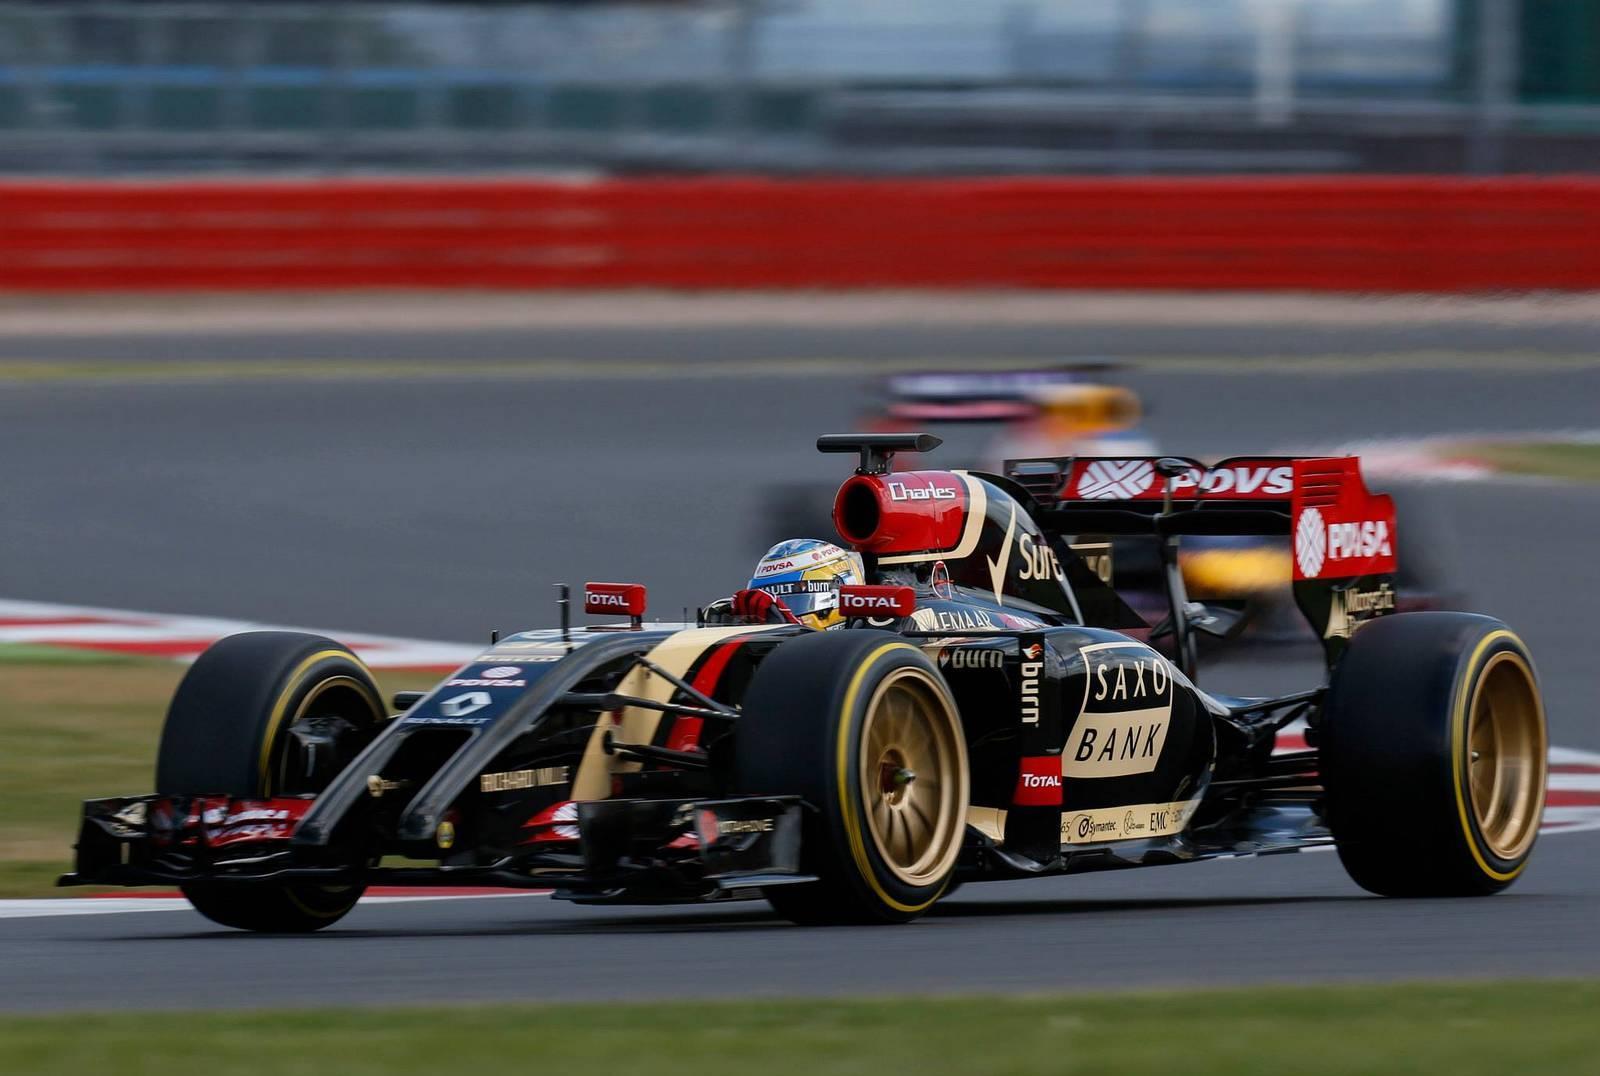 F1 2015: новый уровень реалистичности на PC - 1